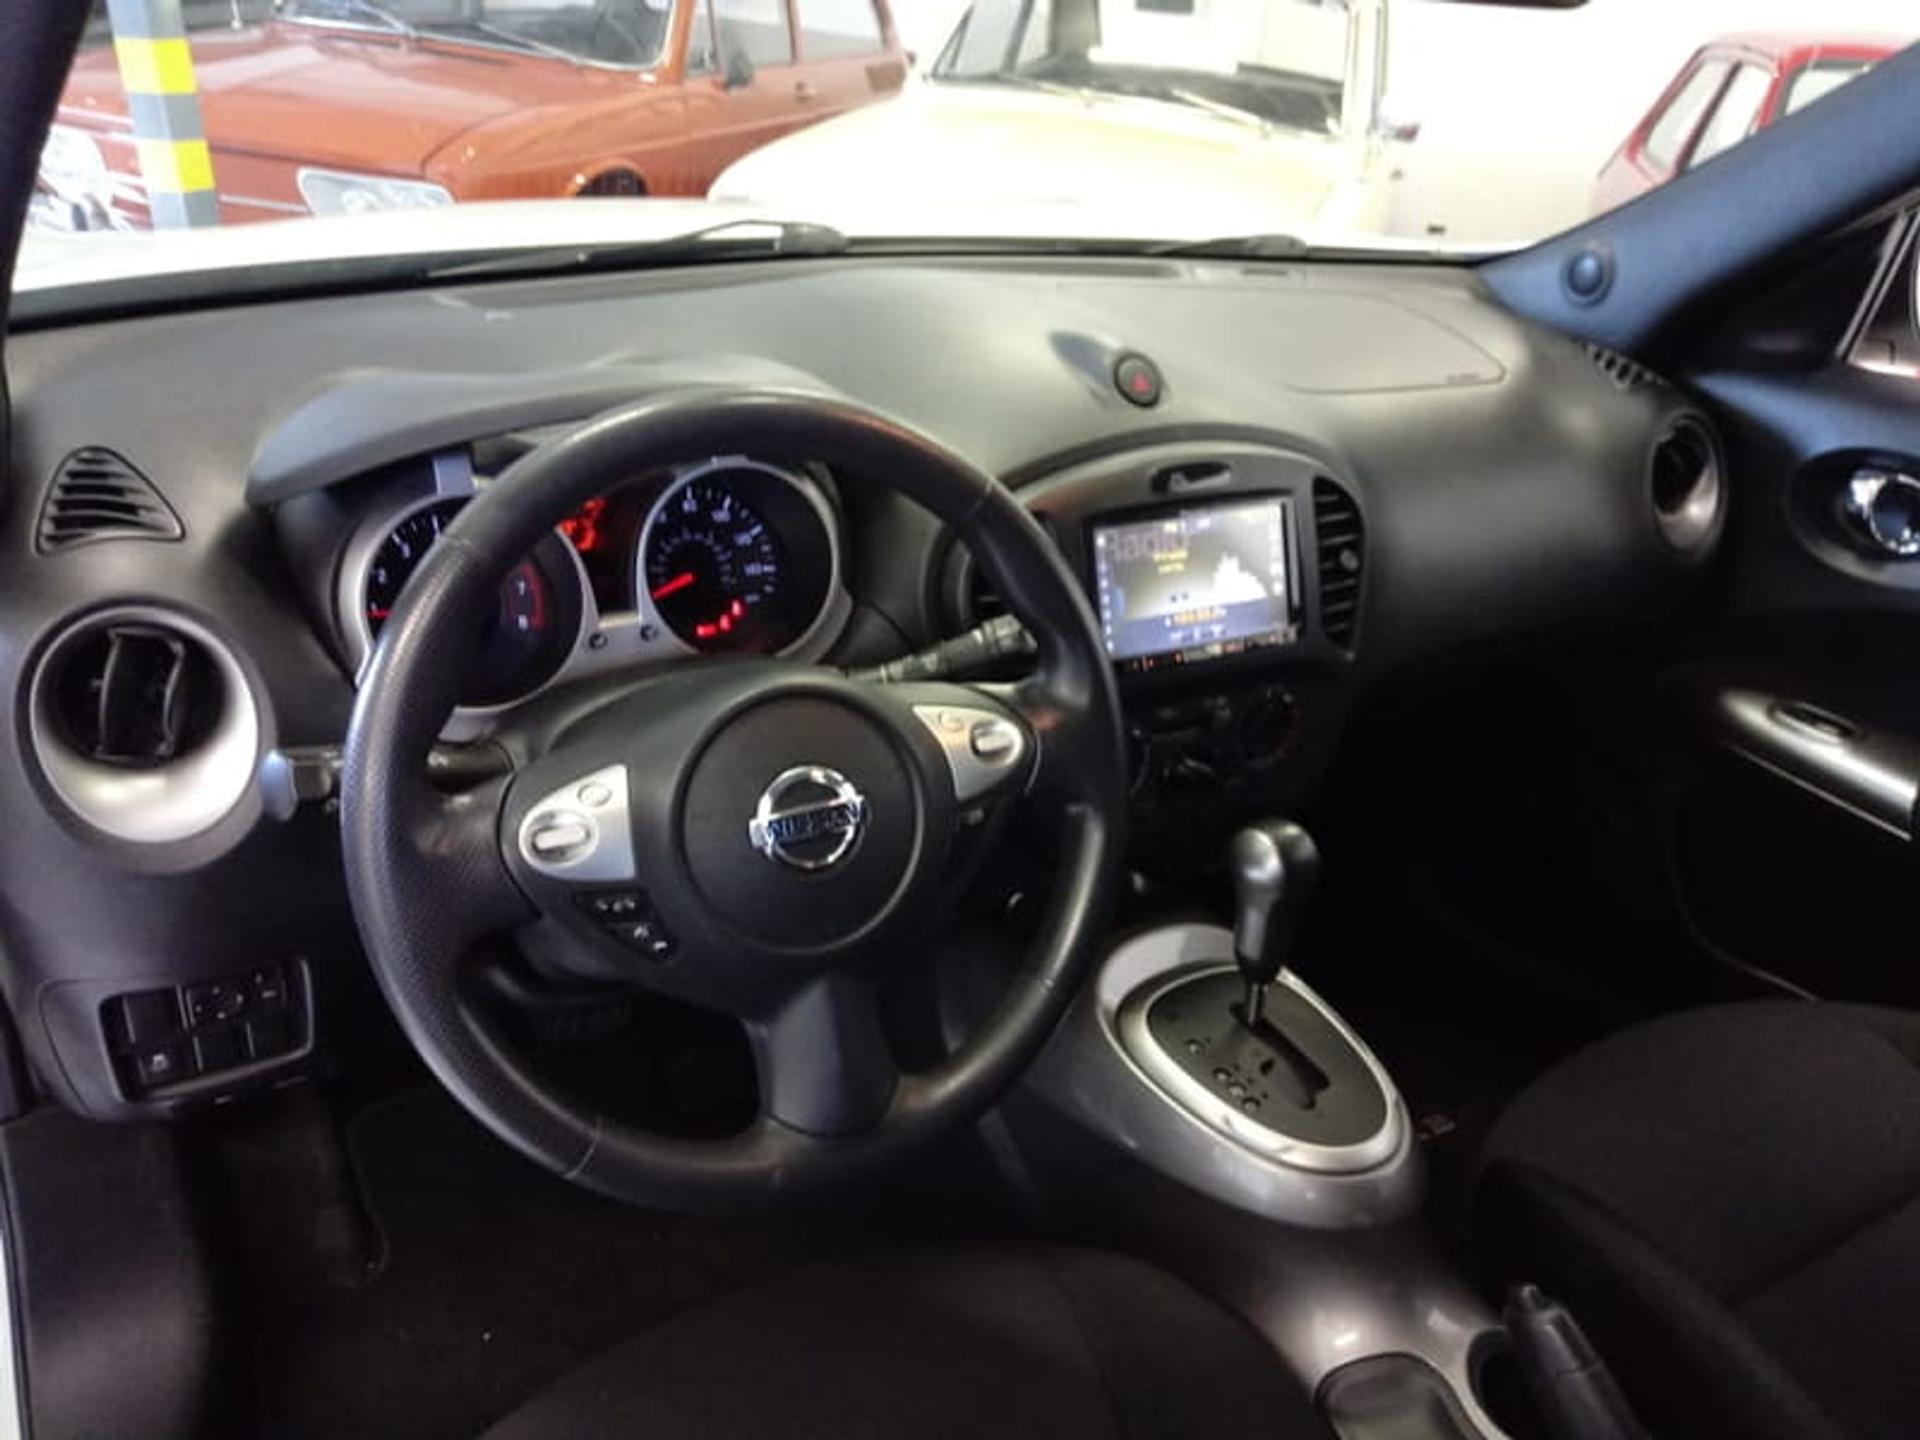 Nissan Juke 1.6 Turbo Gasolina S Awd Cvt Wmimagem09484904679